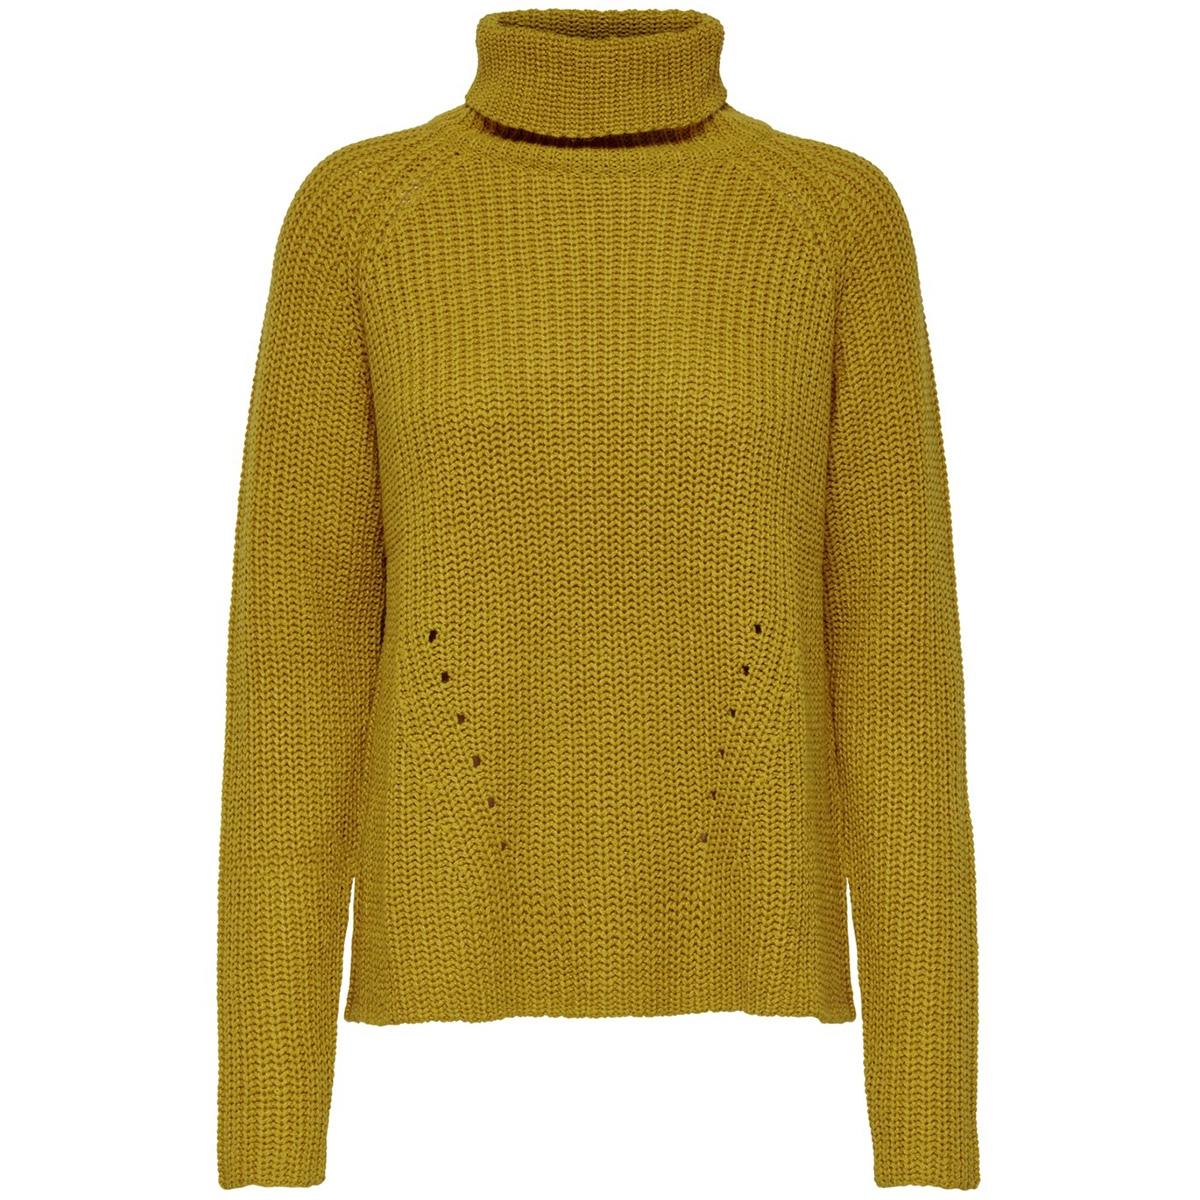 jdyjusty l/s high neck noos pullove 15154665 jacqueline de yong trui harvest gold